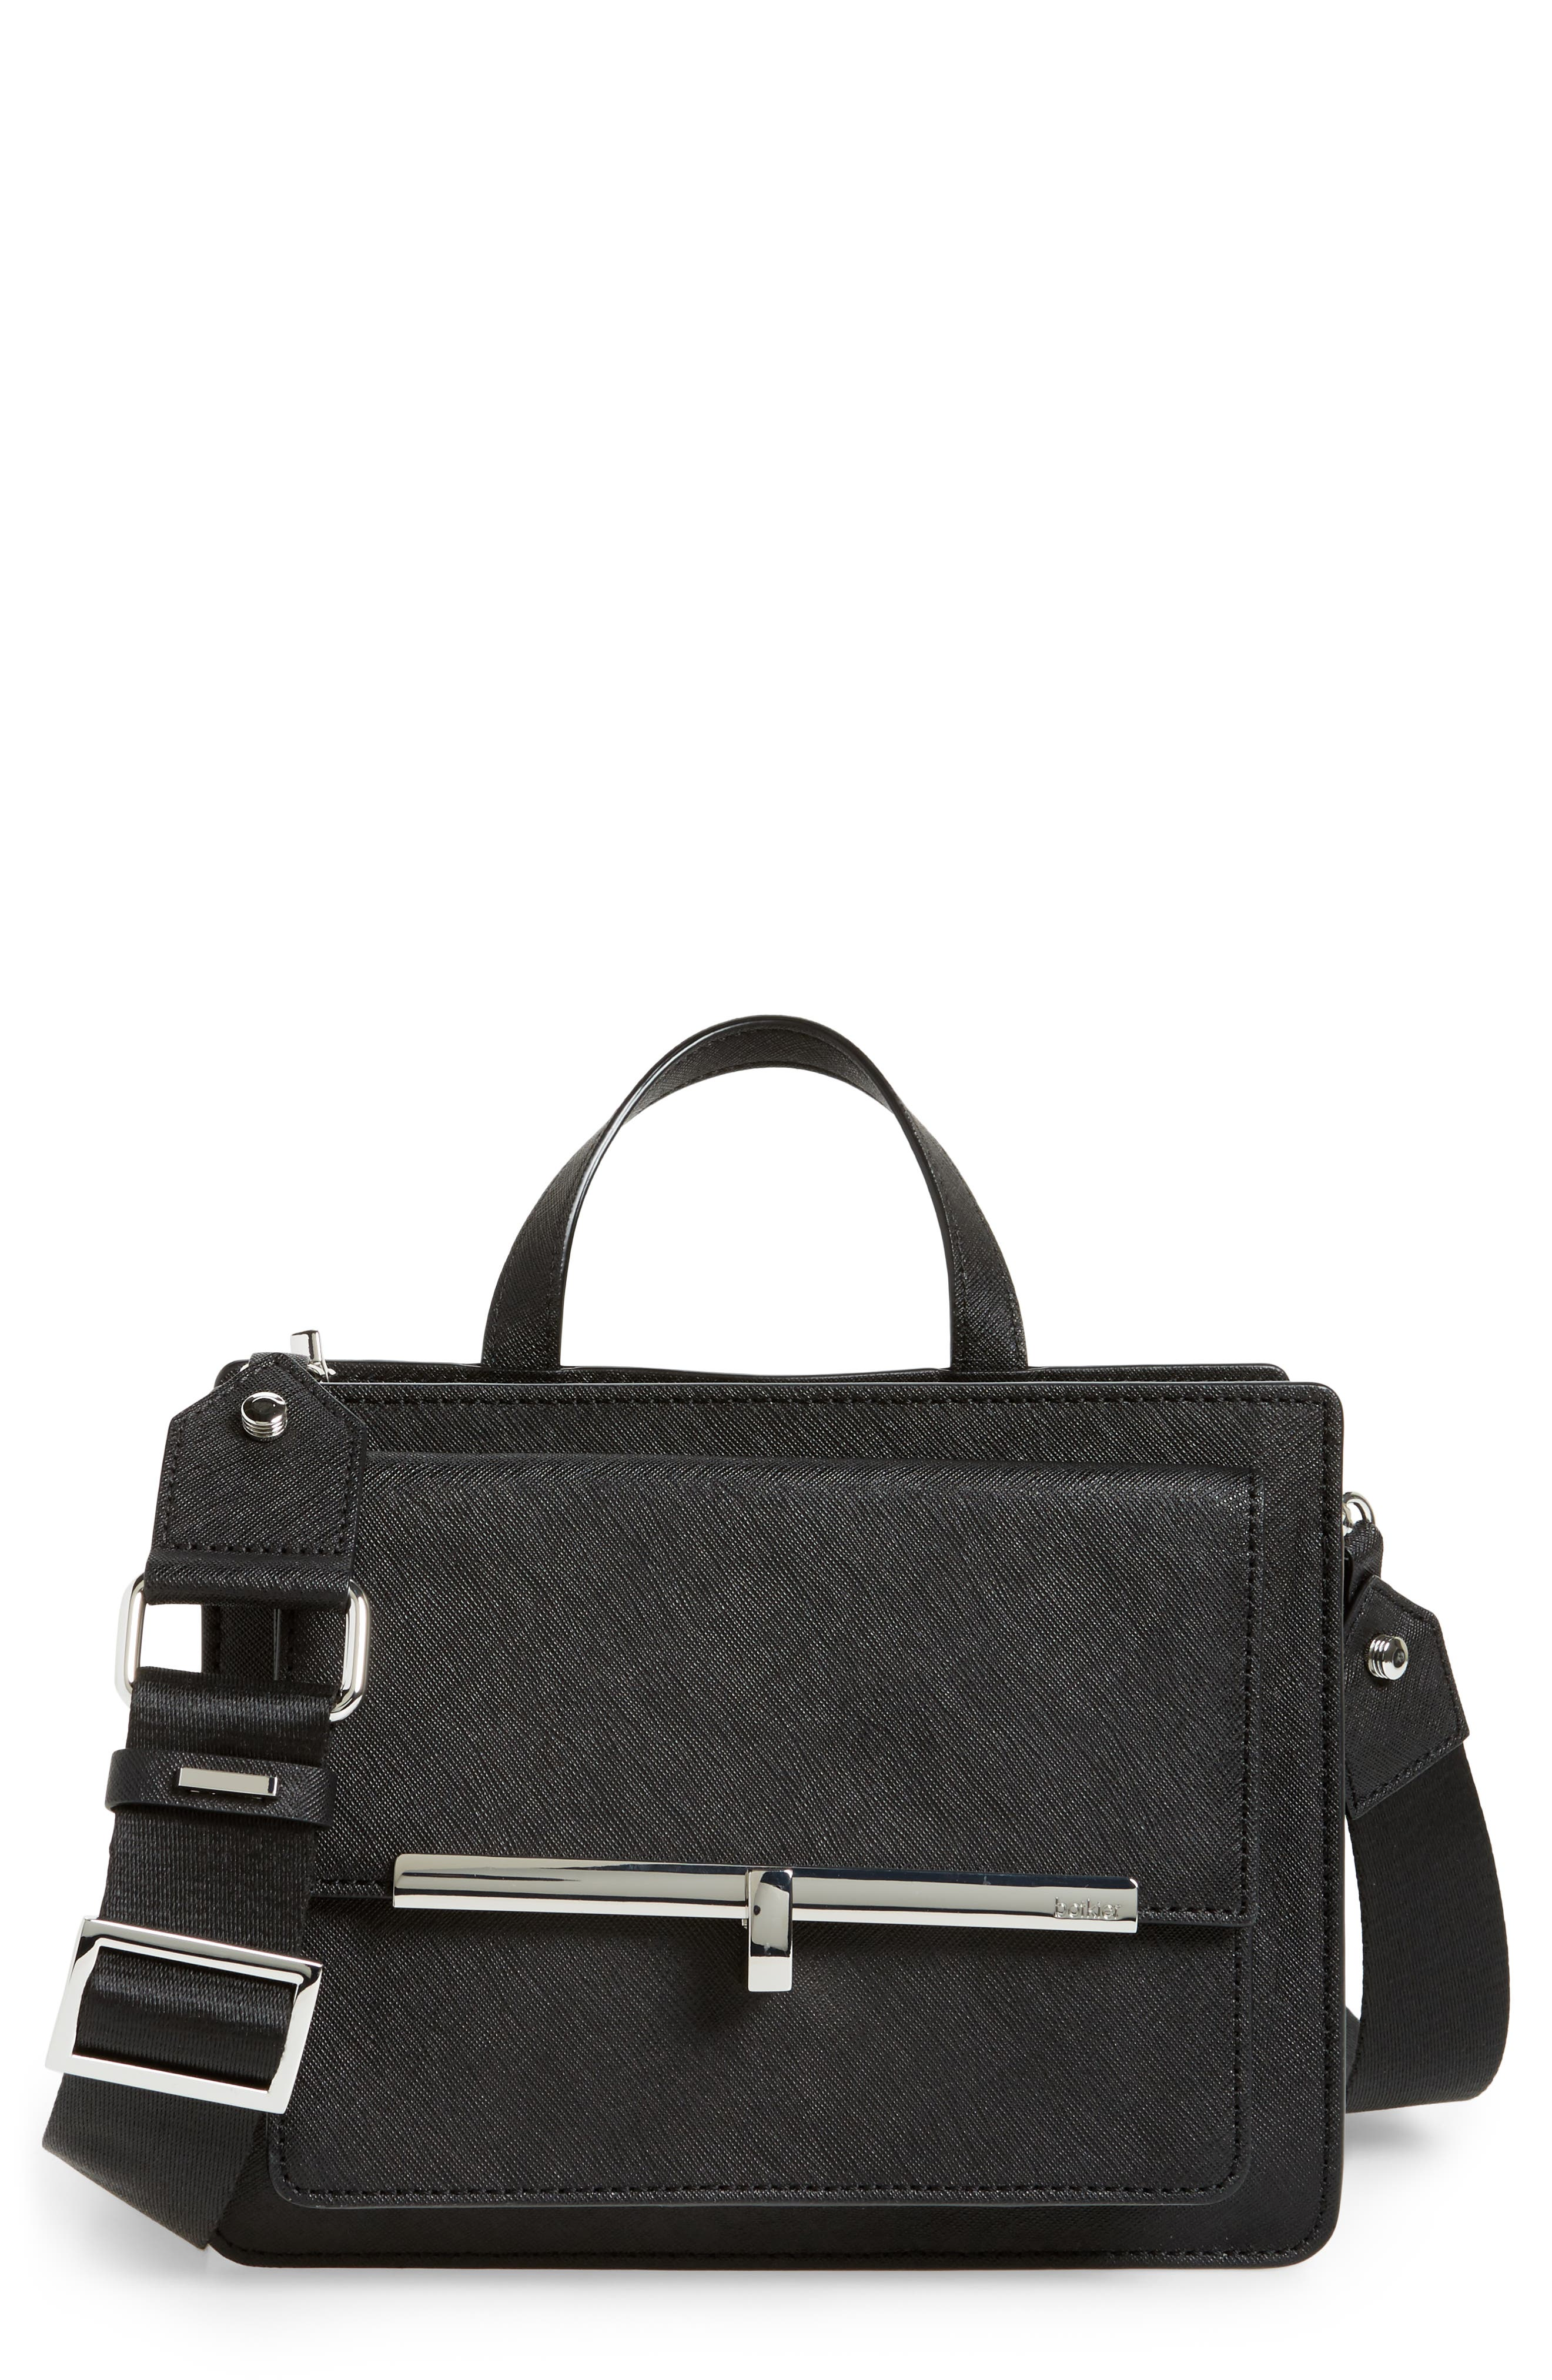 Alternate Image 1 Selected - Botkier Jagger Leather Crossbody Bag